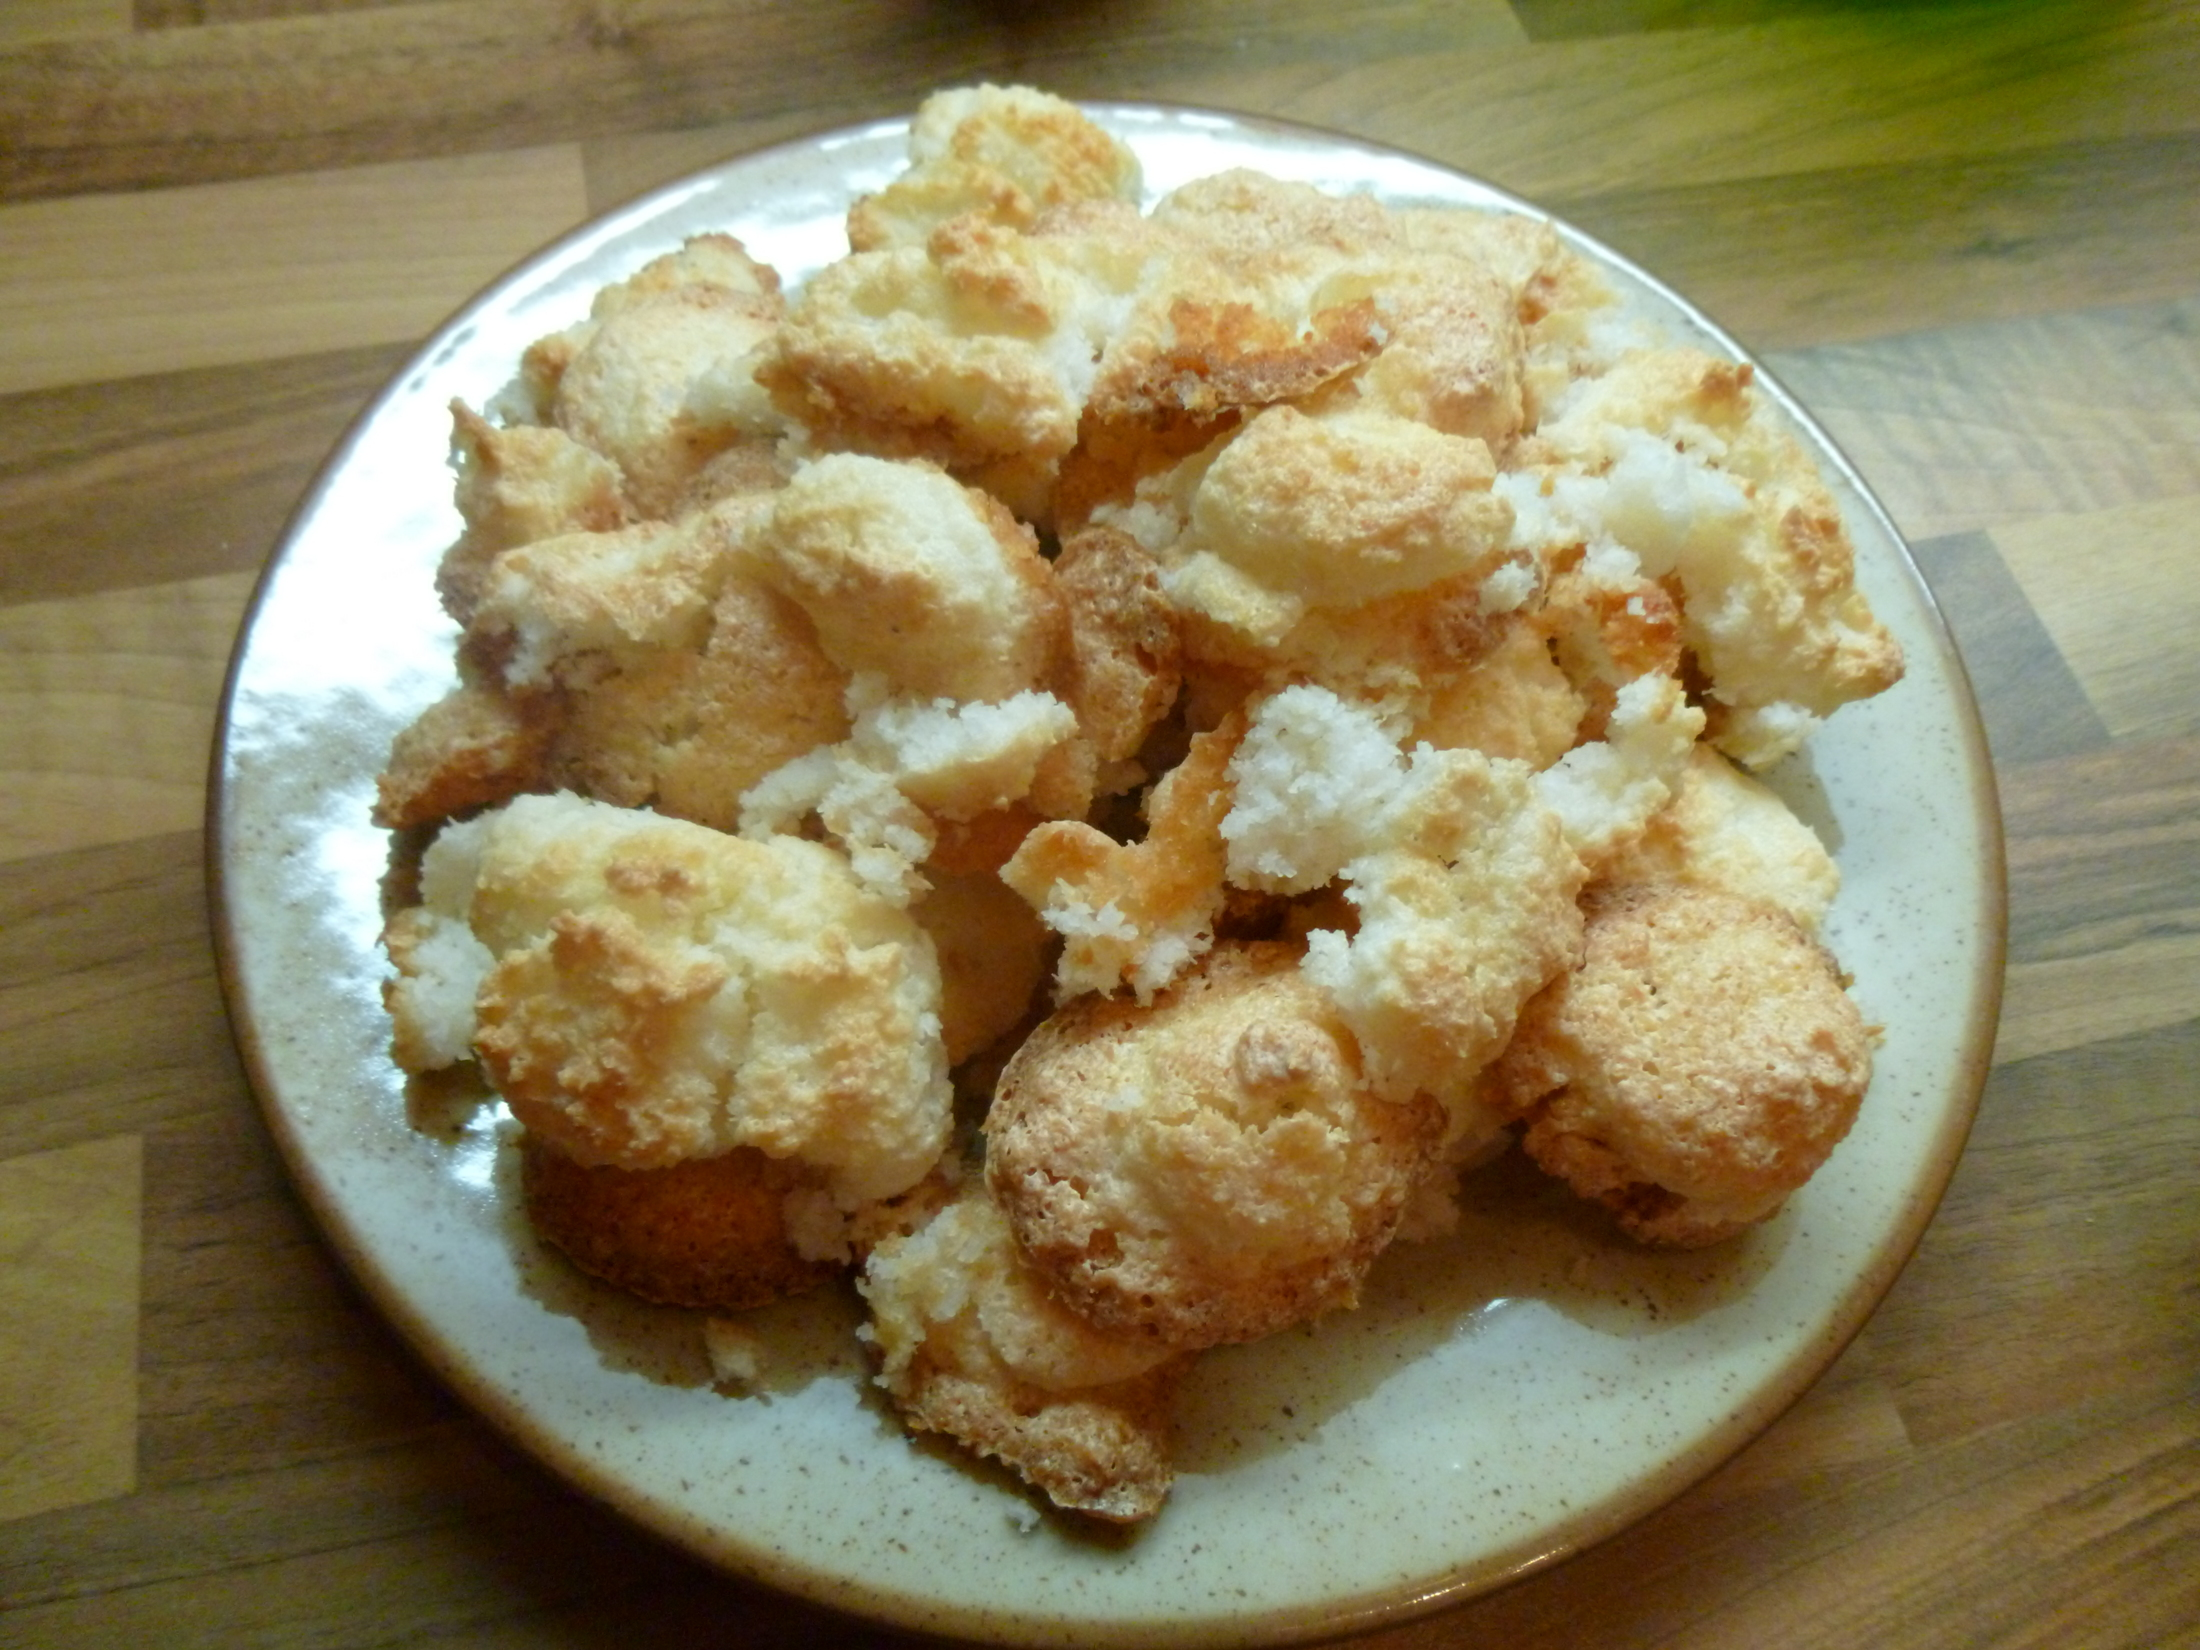 Recept Jednoduché kokosové pusinky - Jednoduché kokosové pusinky - Mňamka